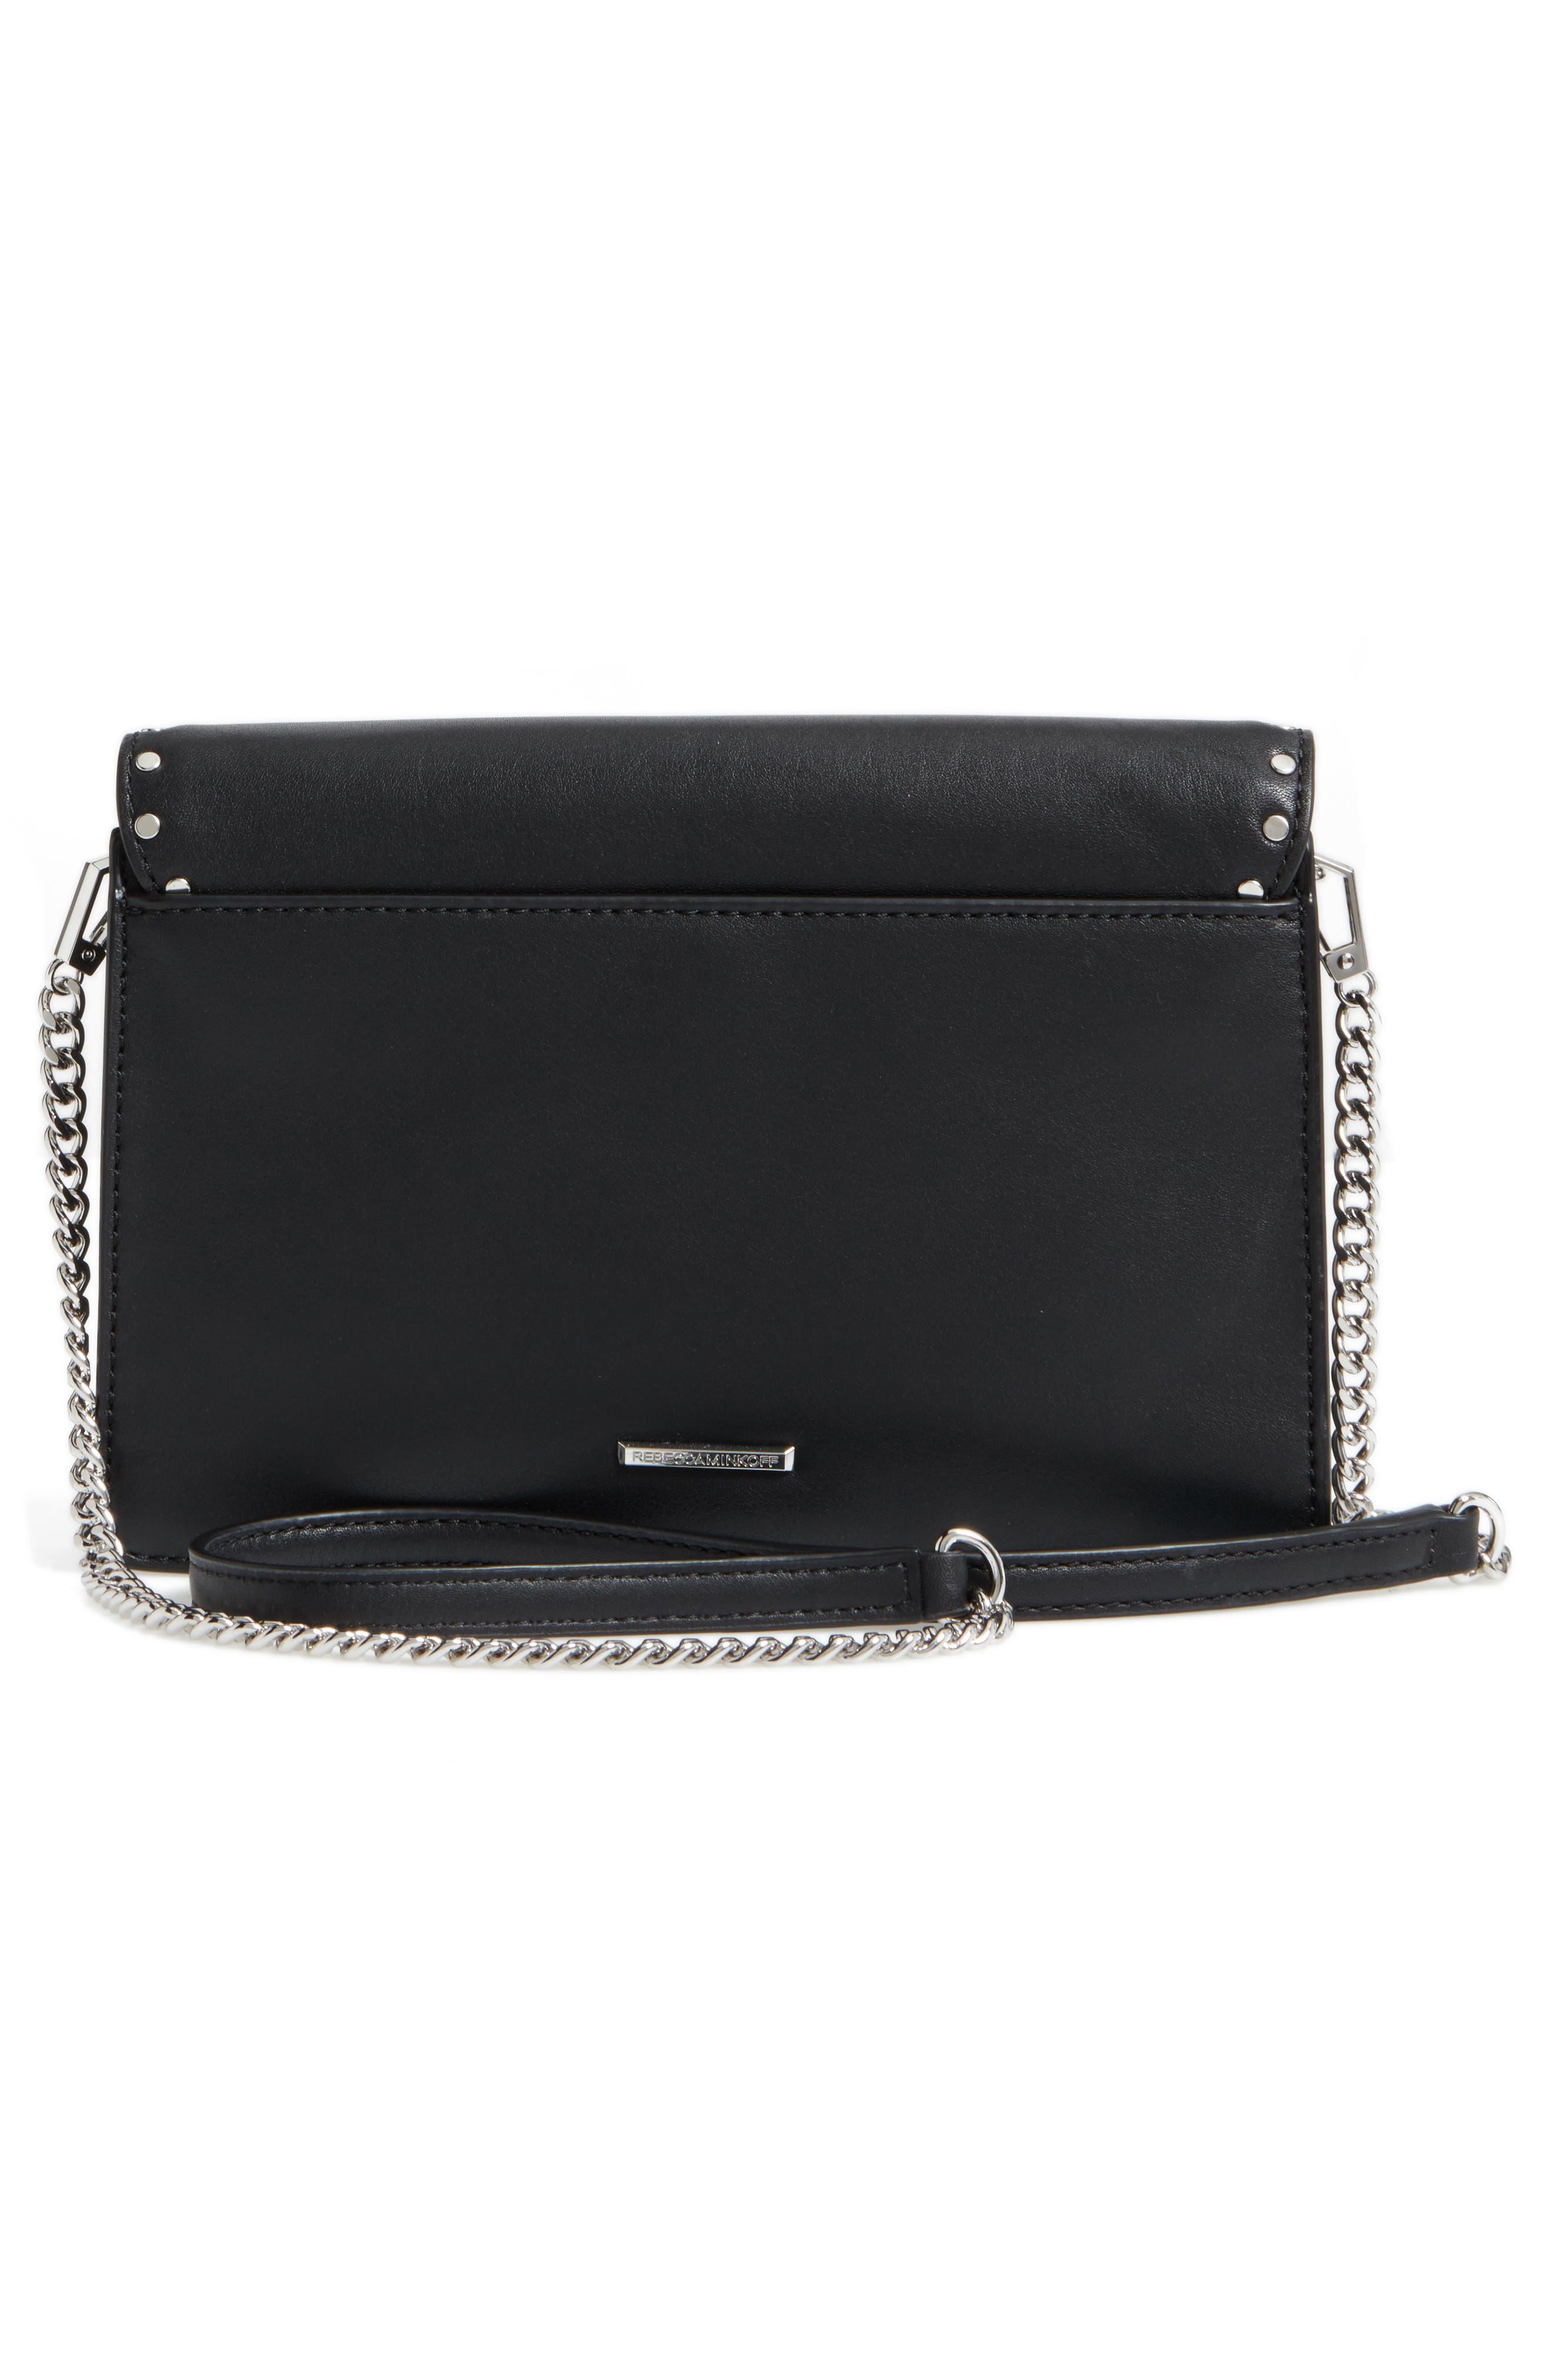 Medium Midnighter Leather Crossbody Bag,                             Alternate thumbnail 3, color,                             001